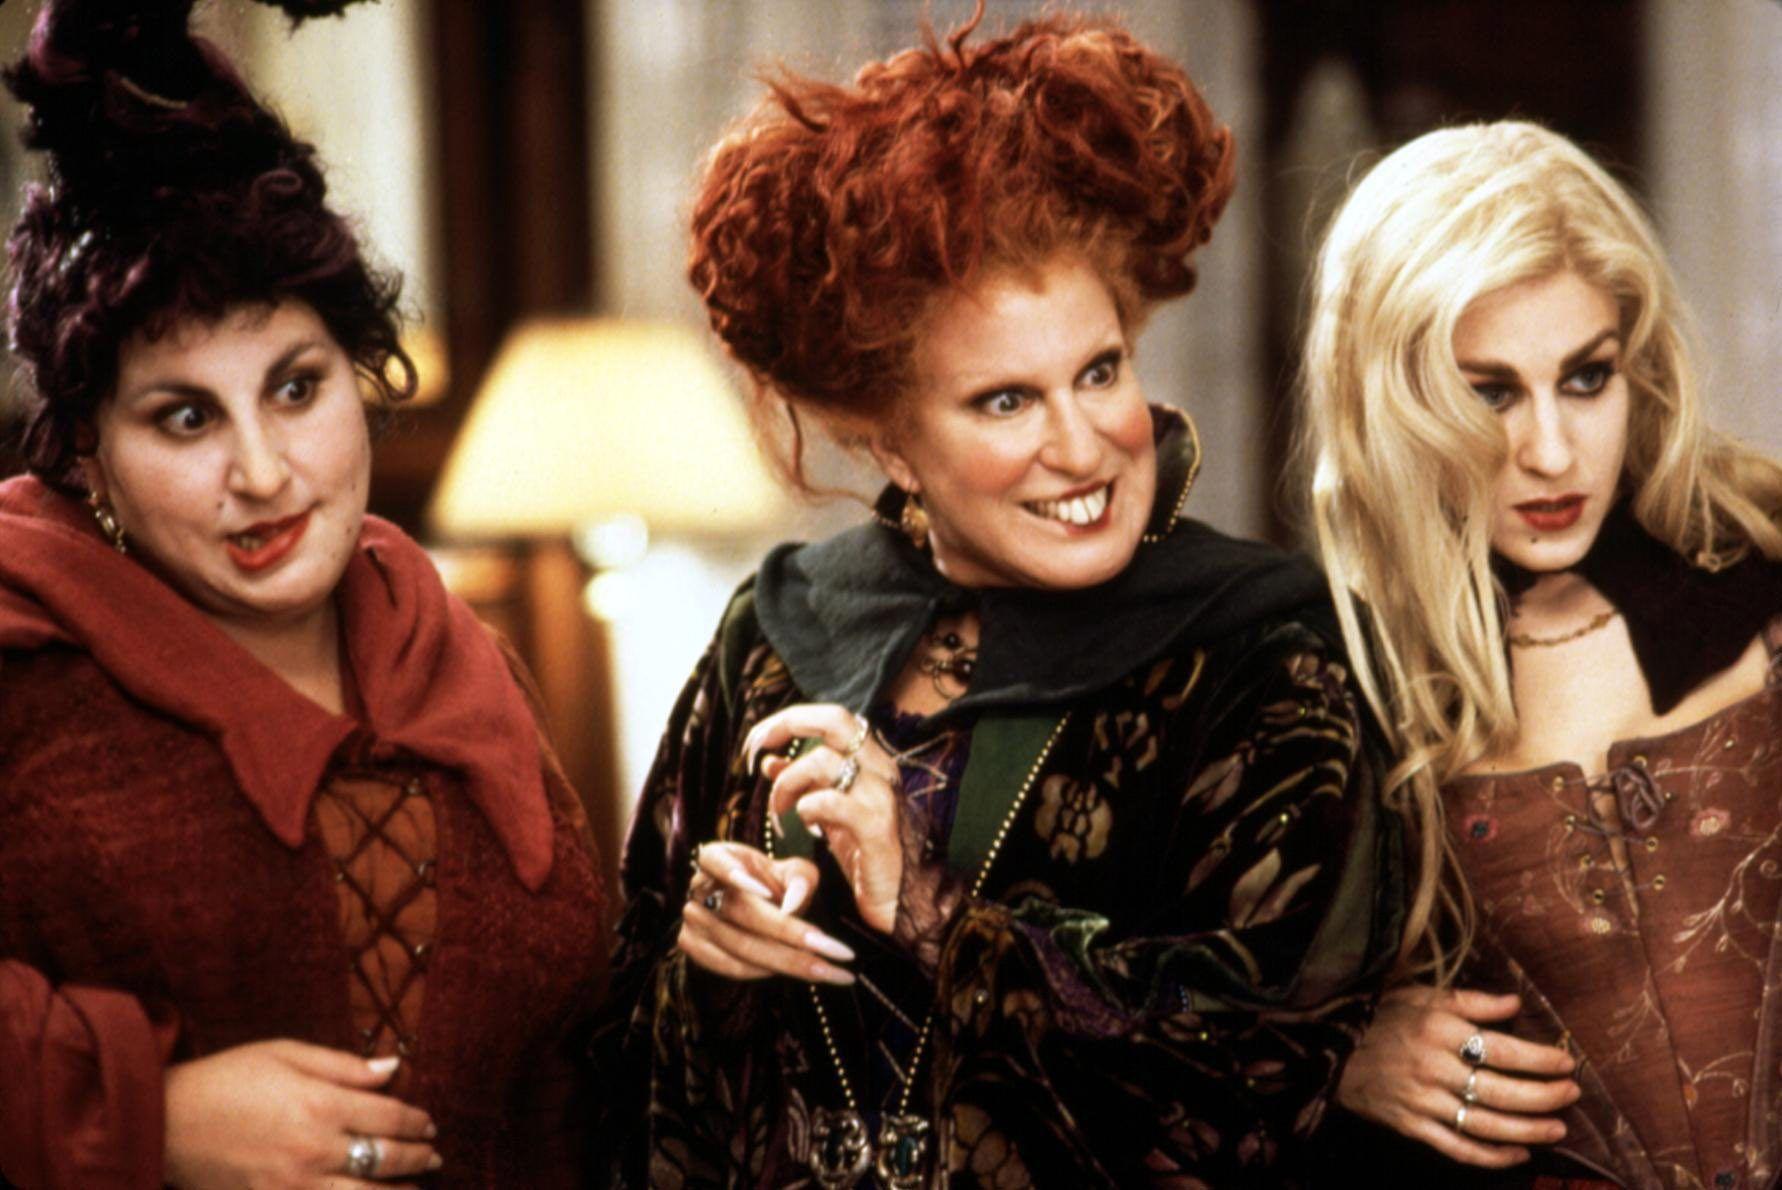 Bette Midler Teases Hocus Pocus Reunion With Cast Photo